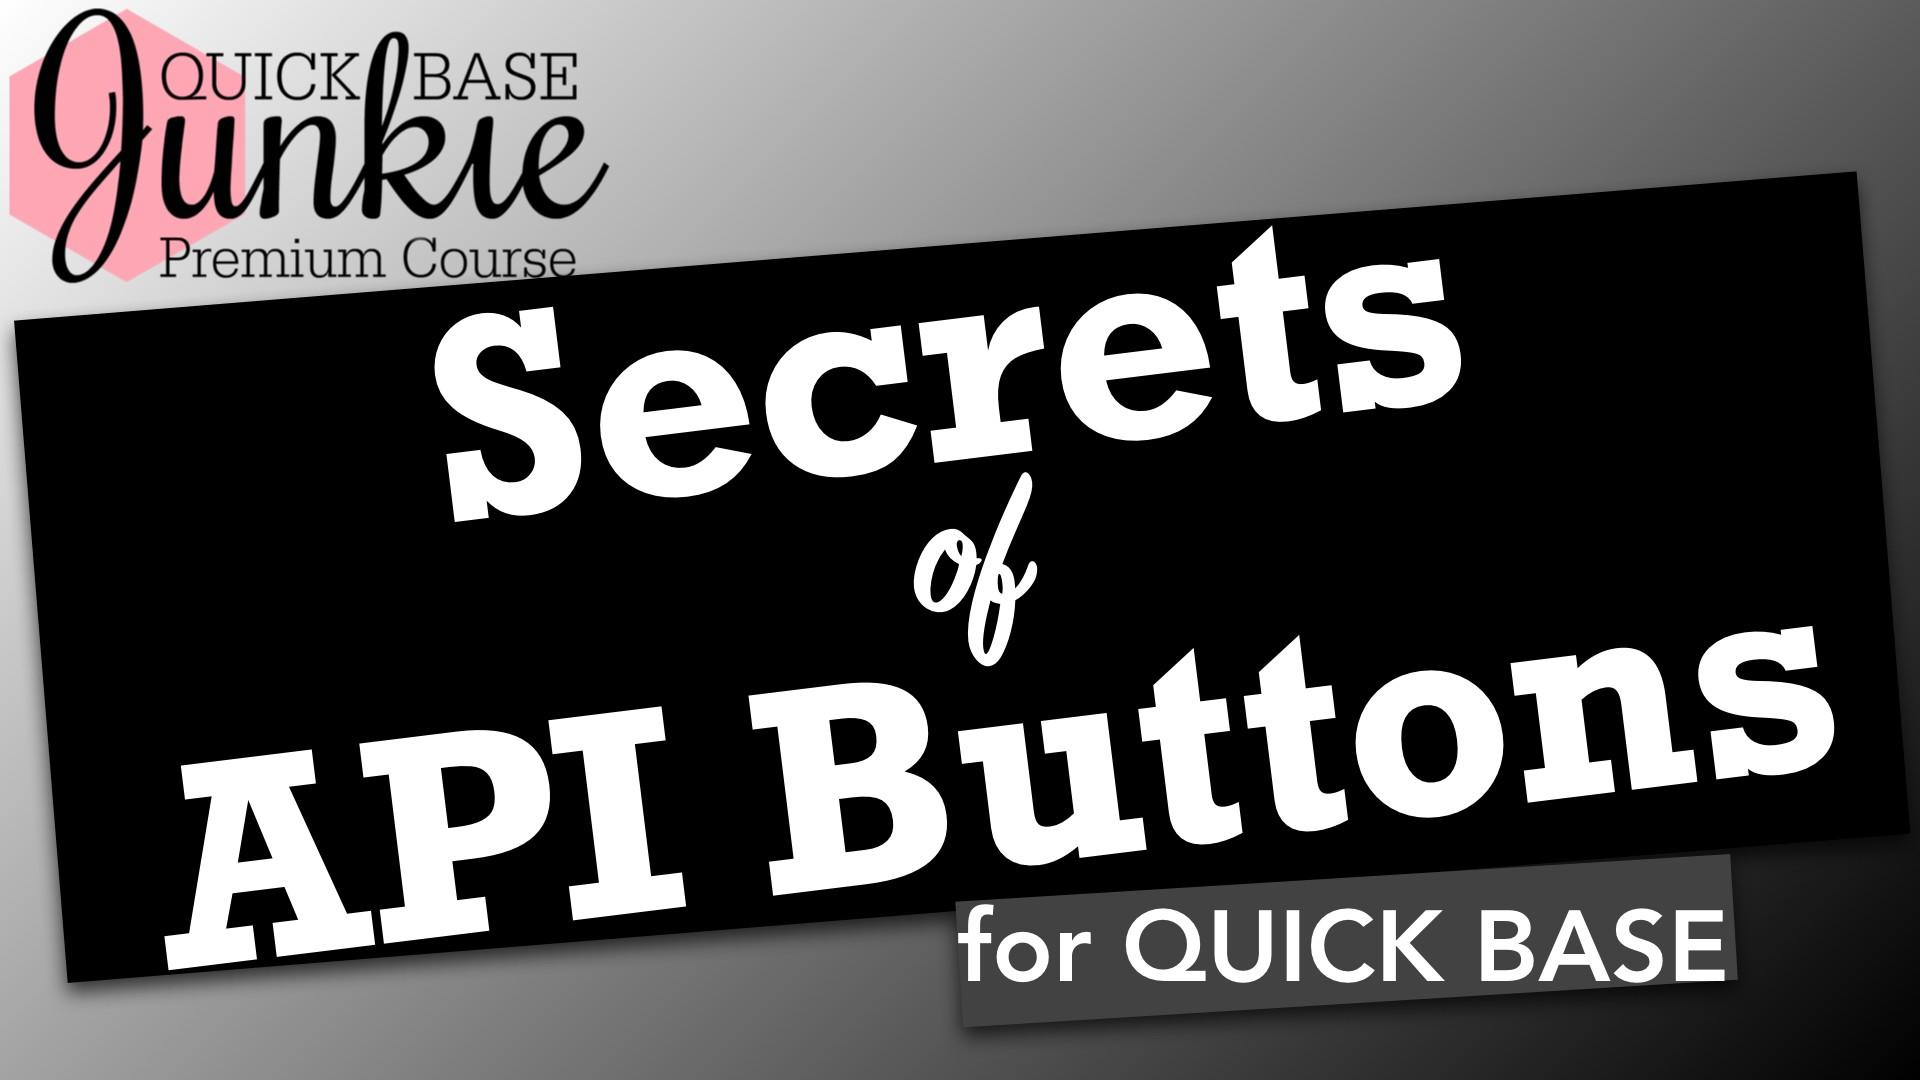 Quick Base Junkie Secrets of API Buttons for Quick Base